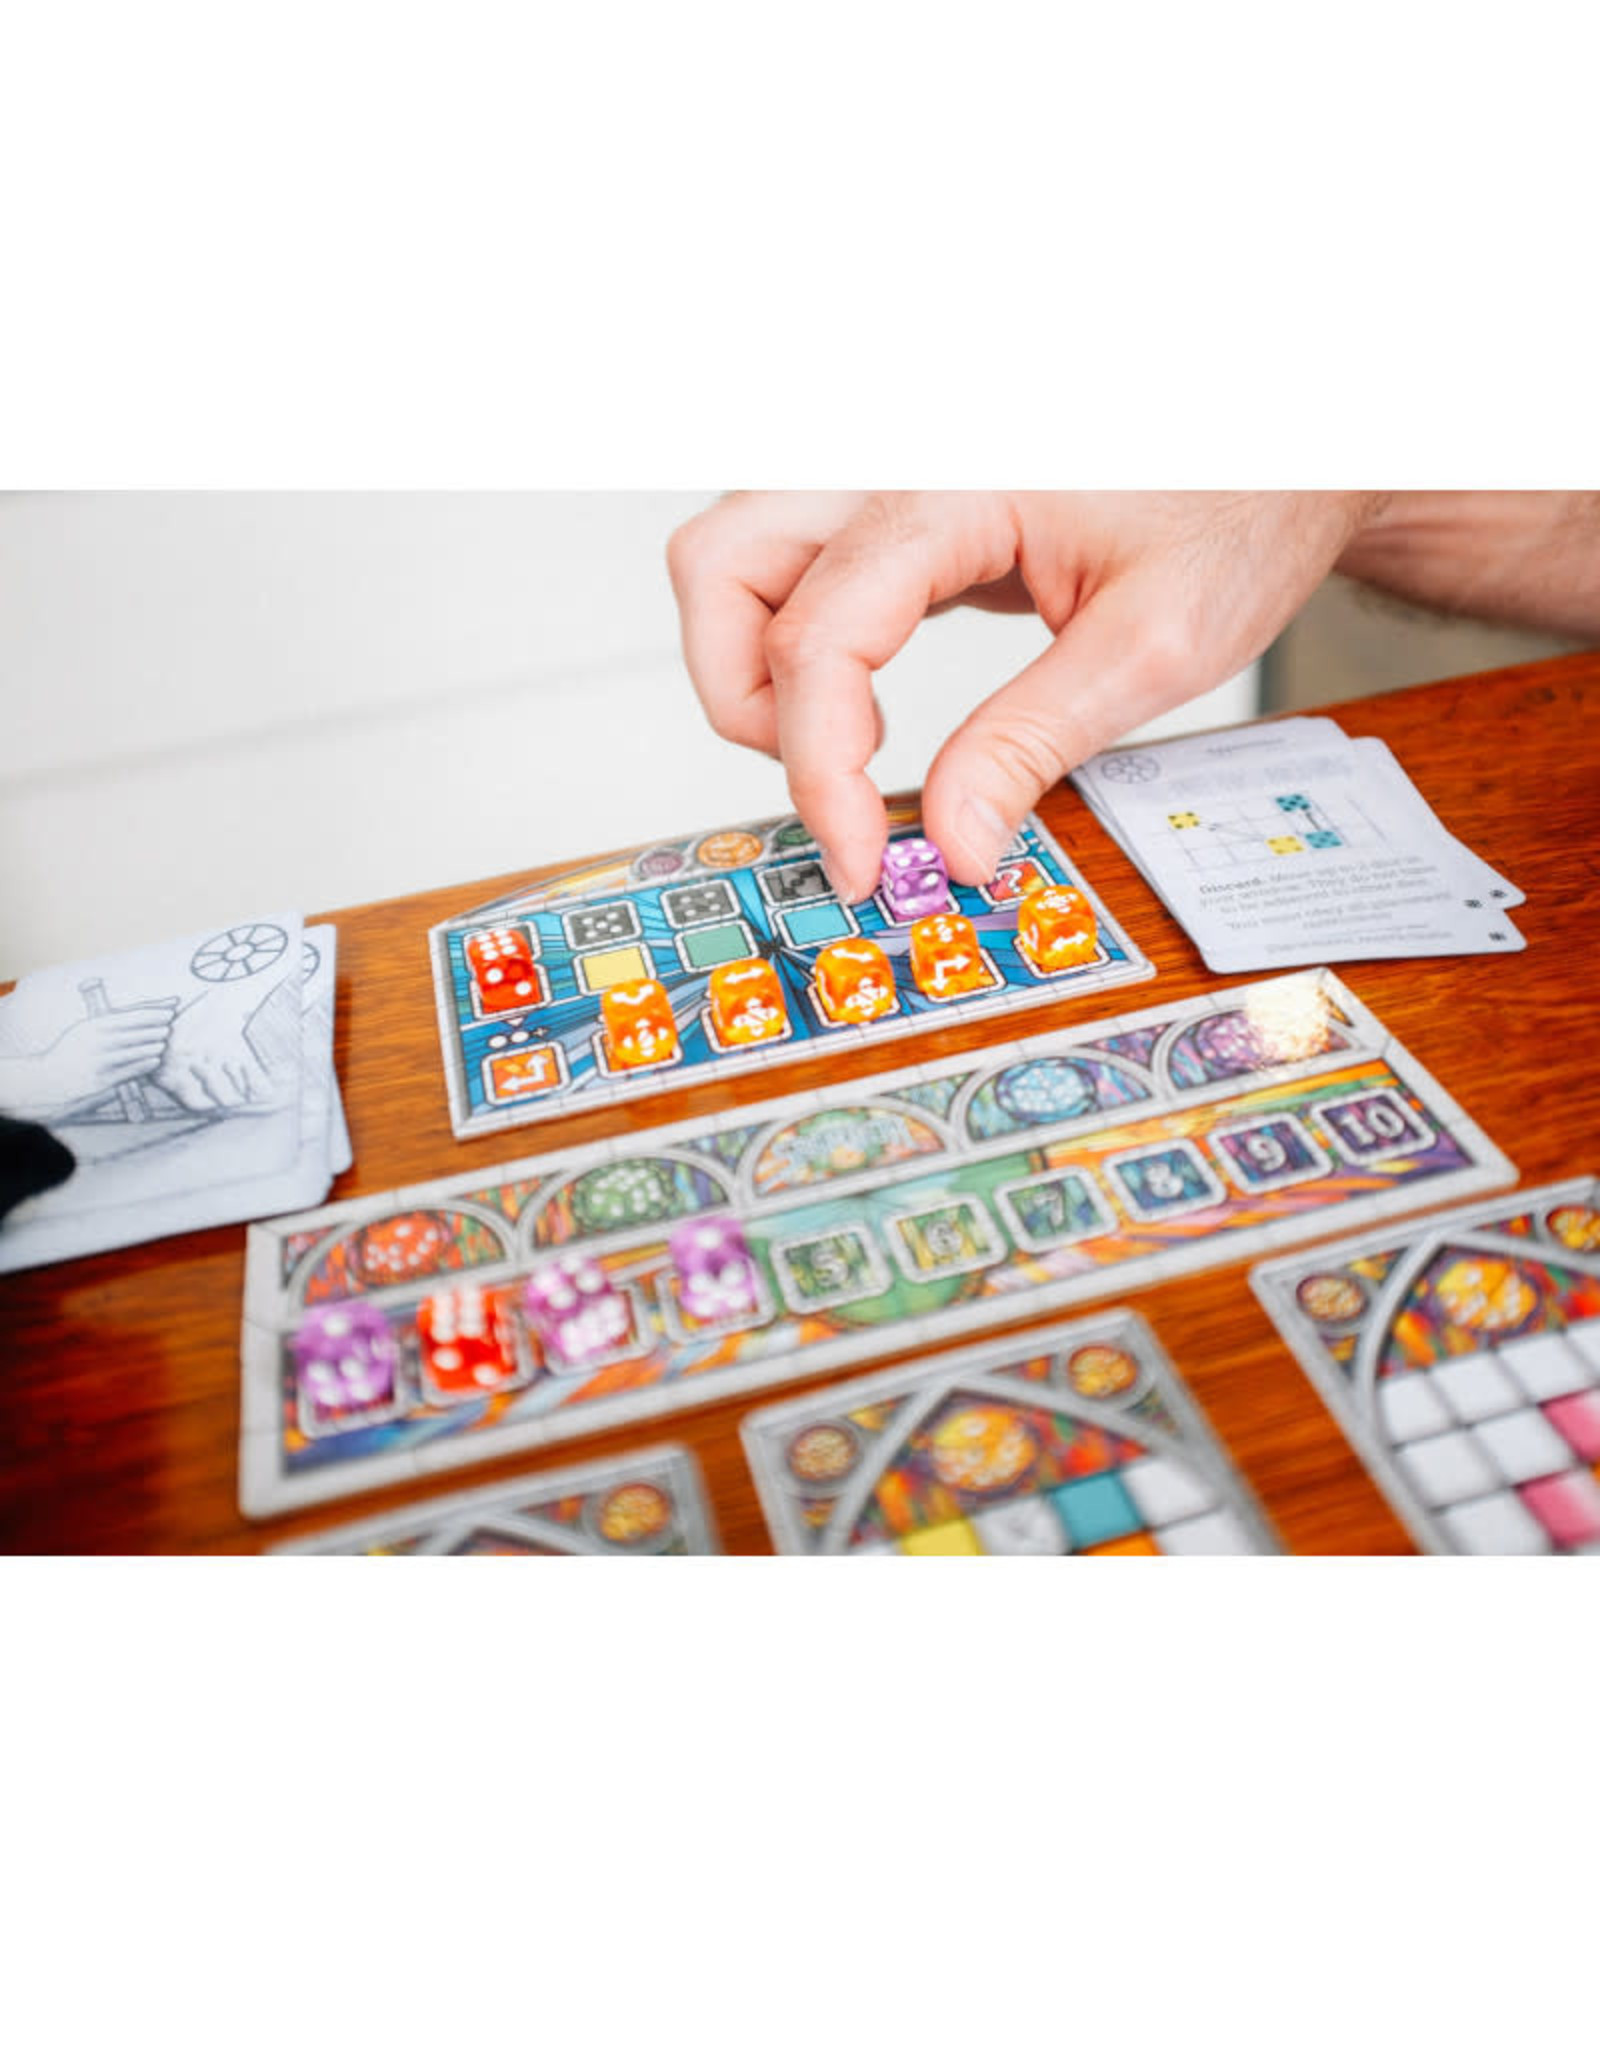 Floodgate Games Sagrada Life Expansion